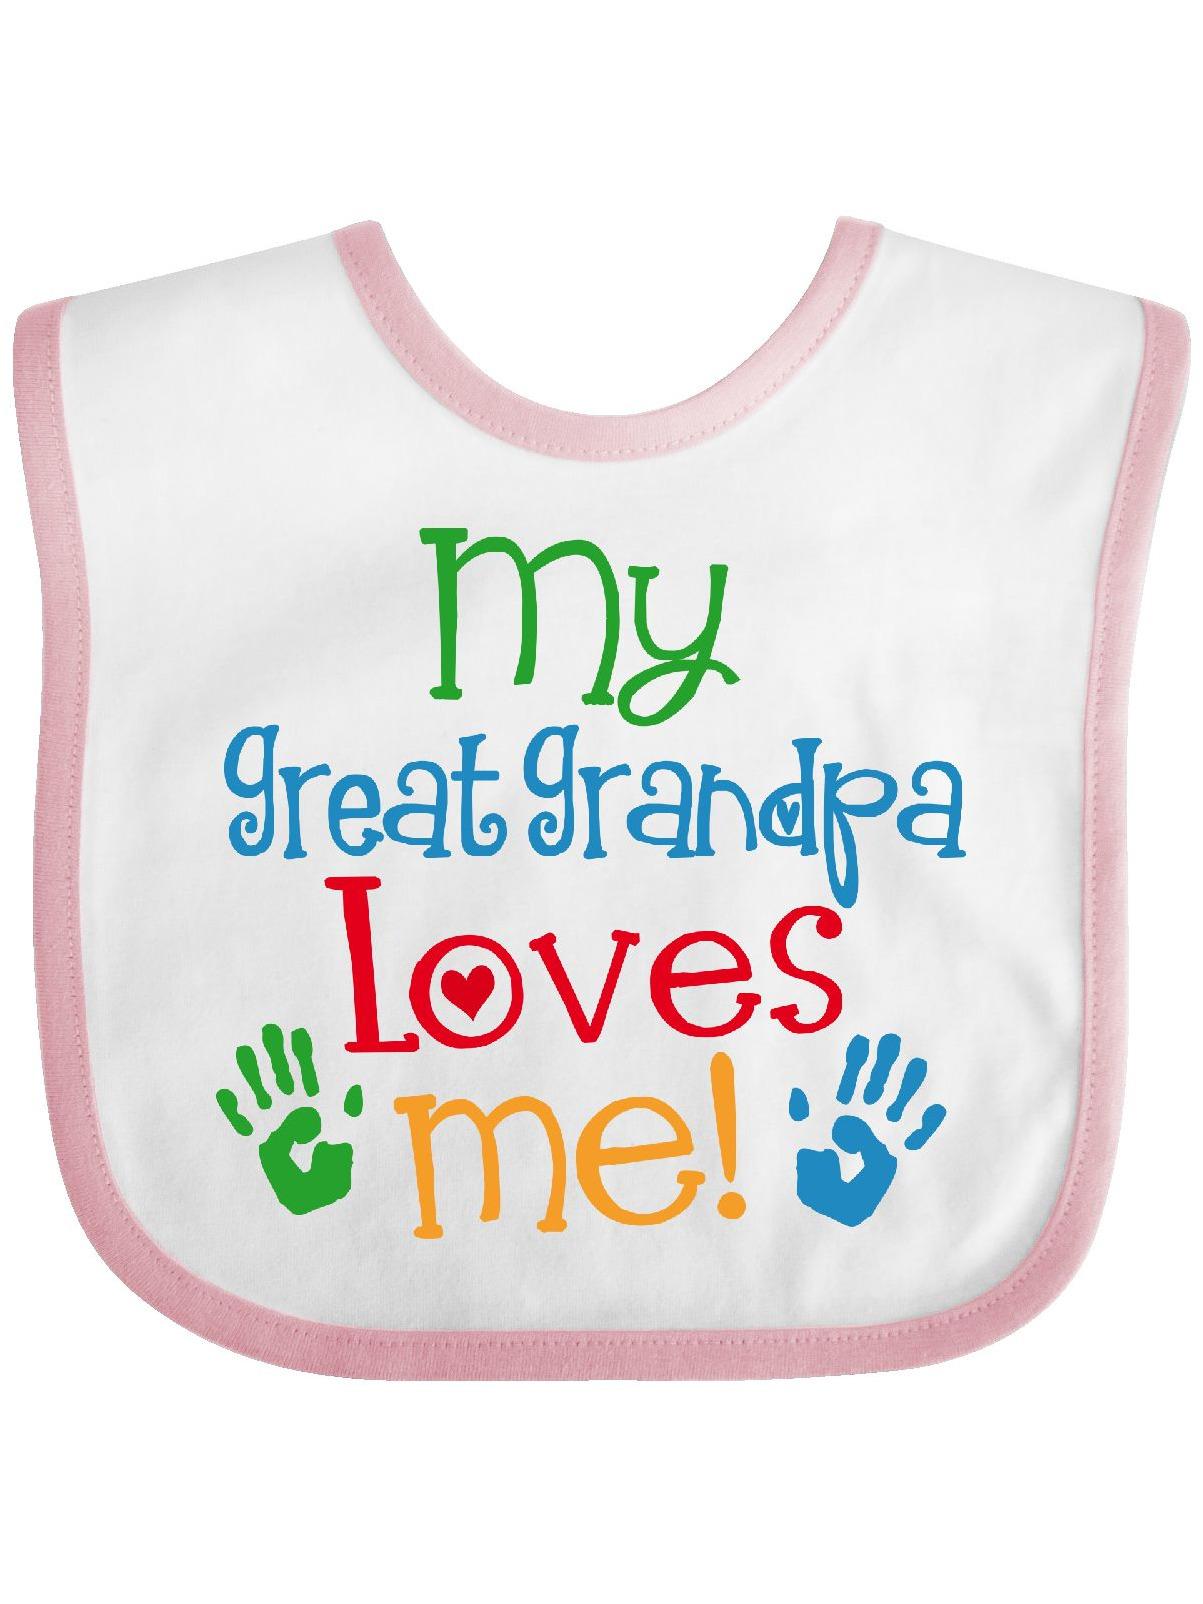 My Great Grandpa Loves Me Baby Bib